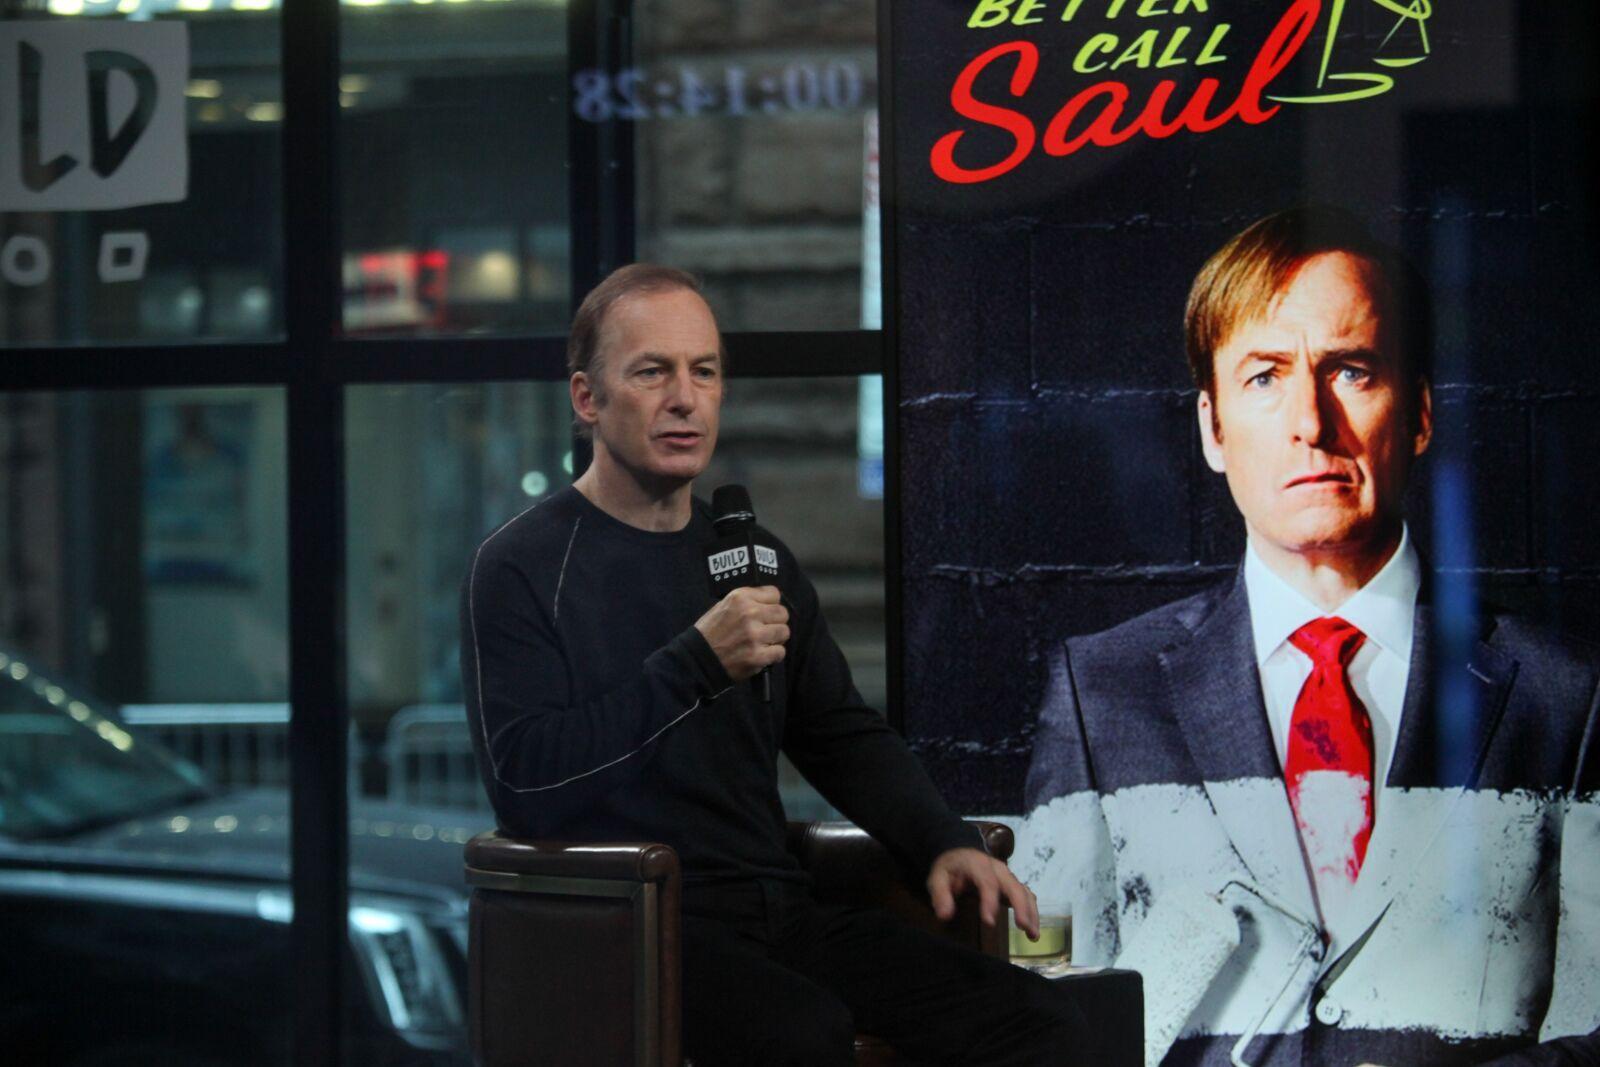 'Better Call Saul' season 4 sounds super depressing at ATX panel